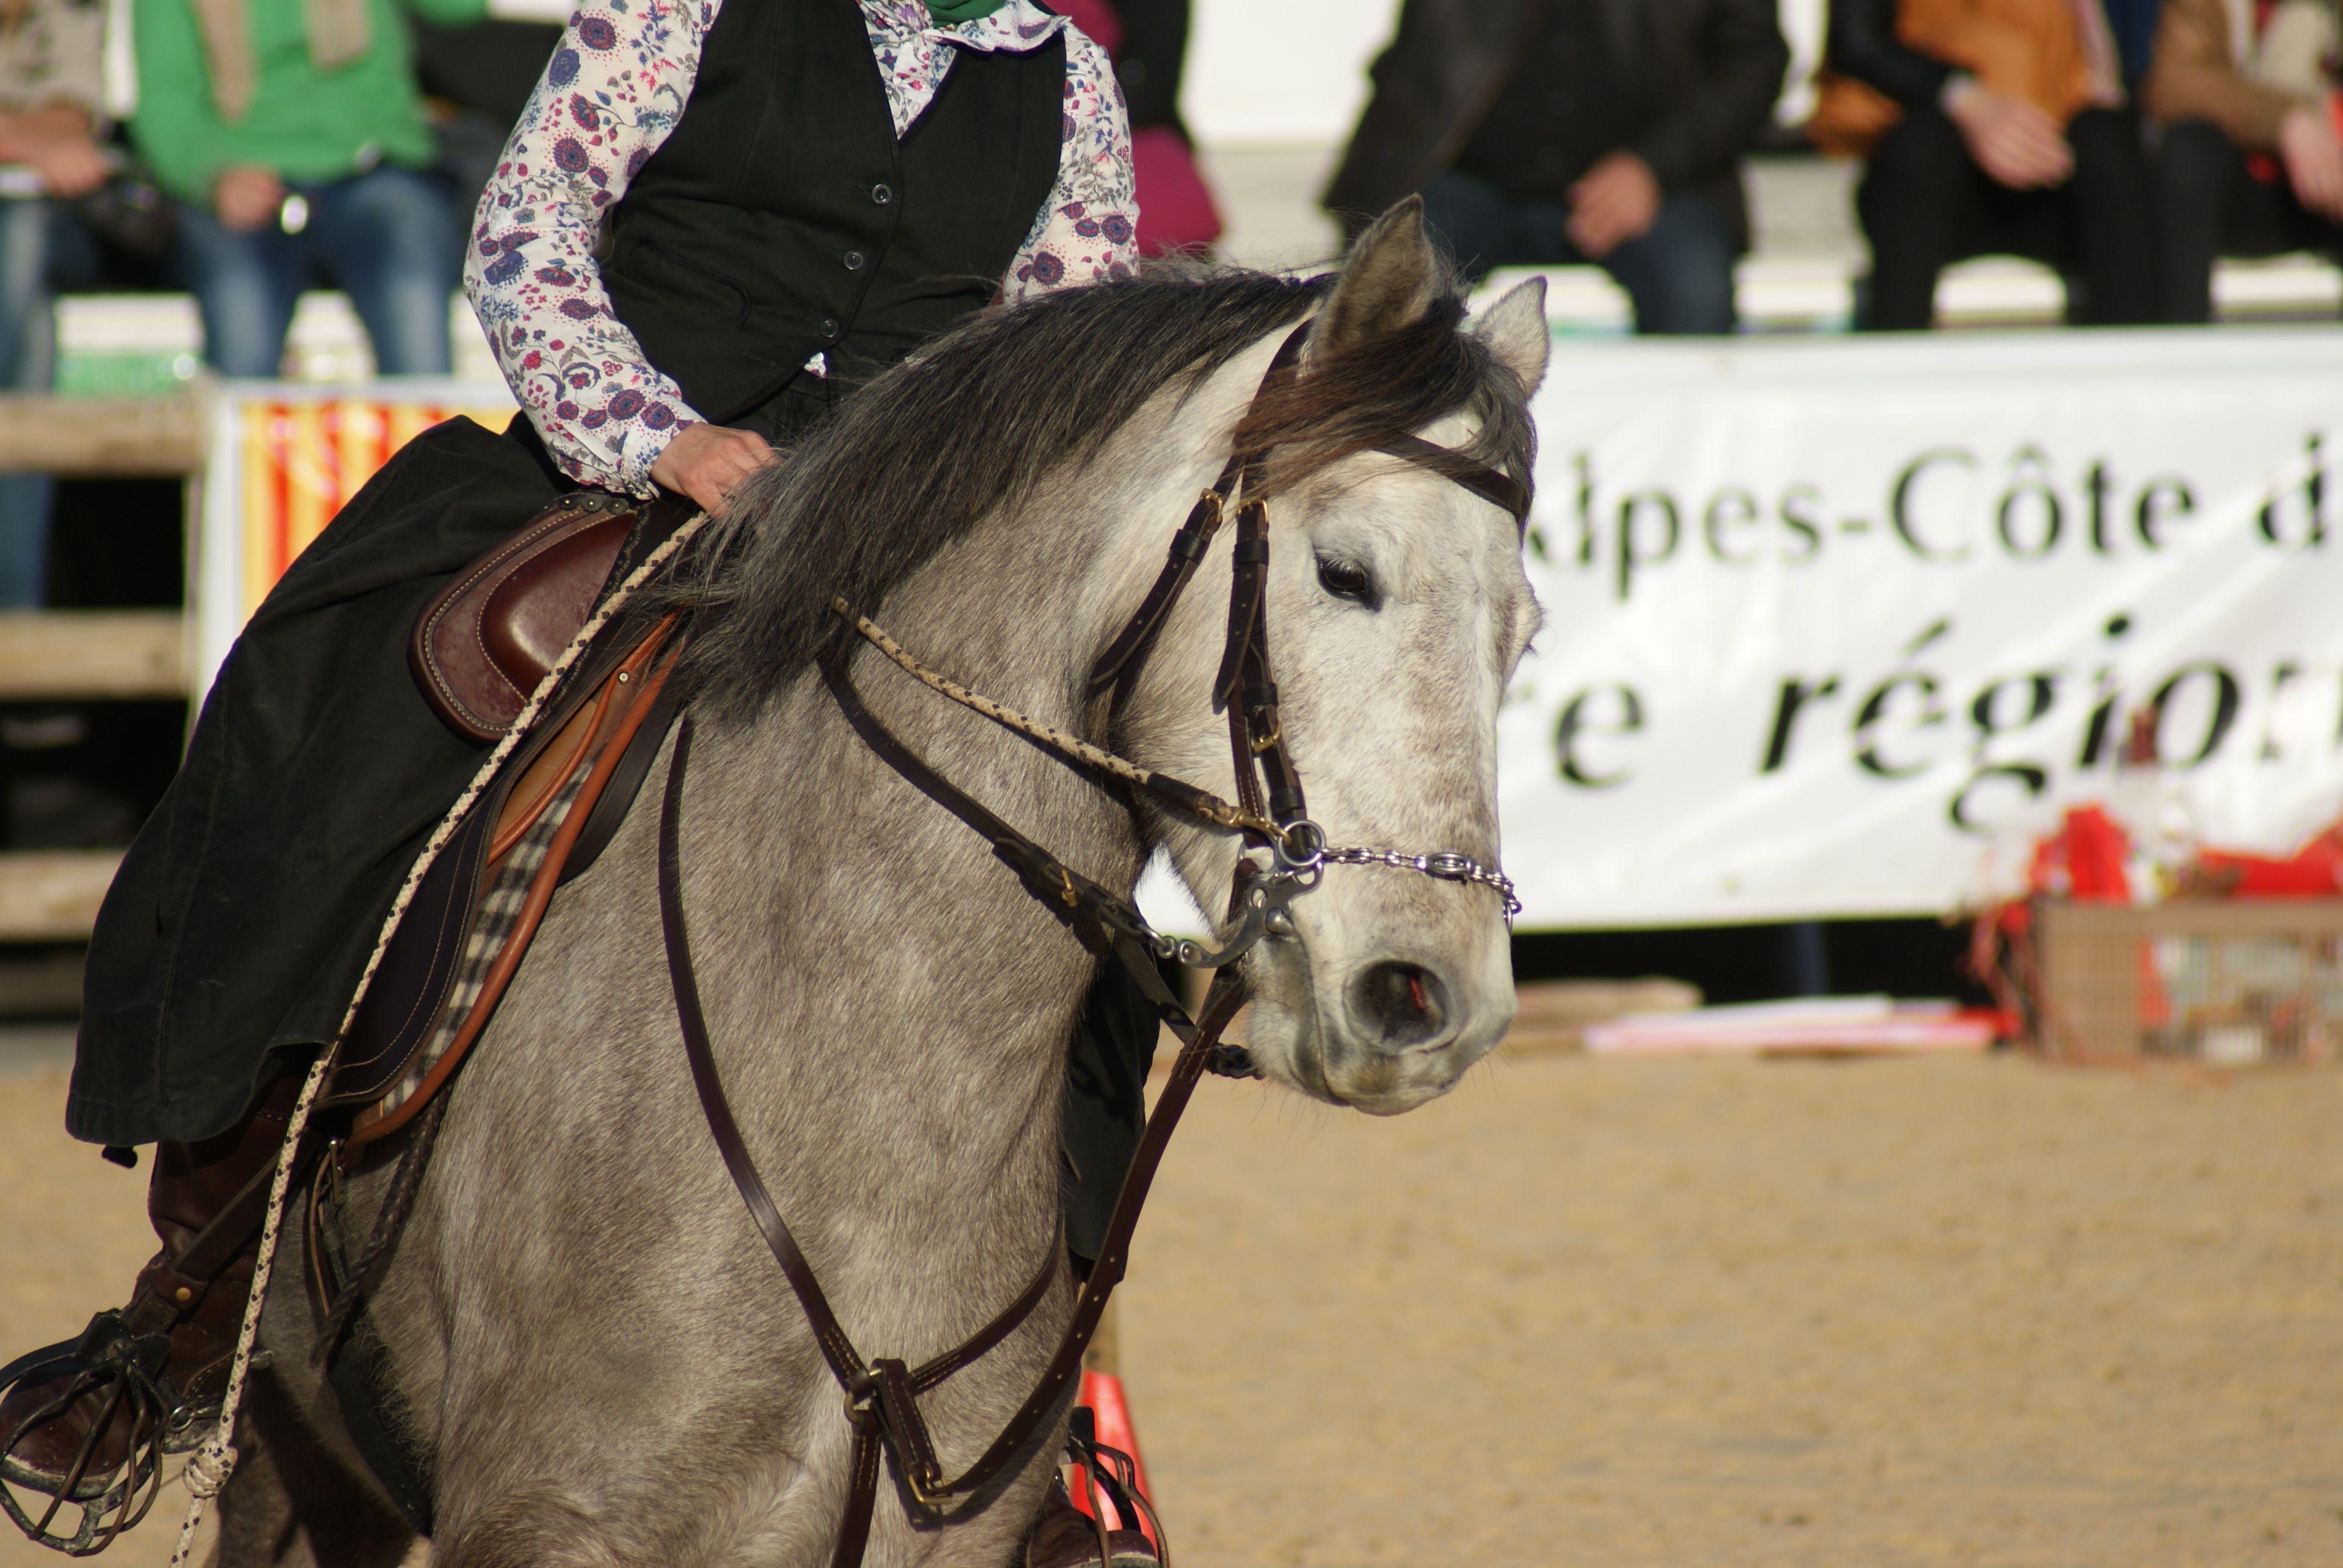 Le salon cheval passion d 39 avignon for Salon du cheval a avignon